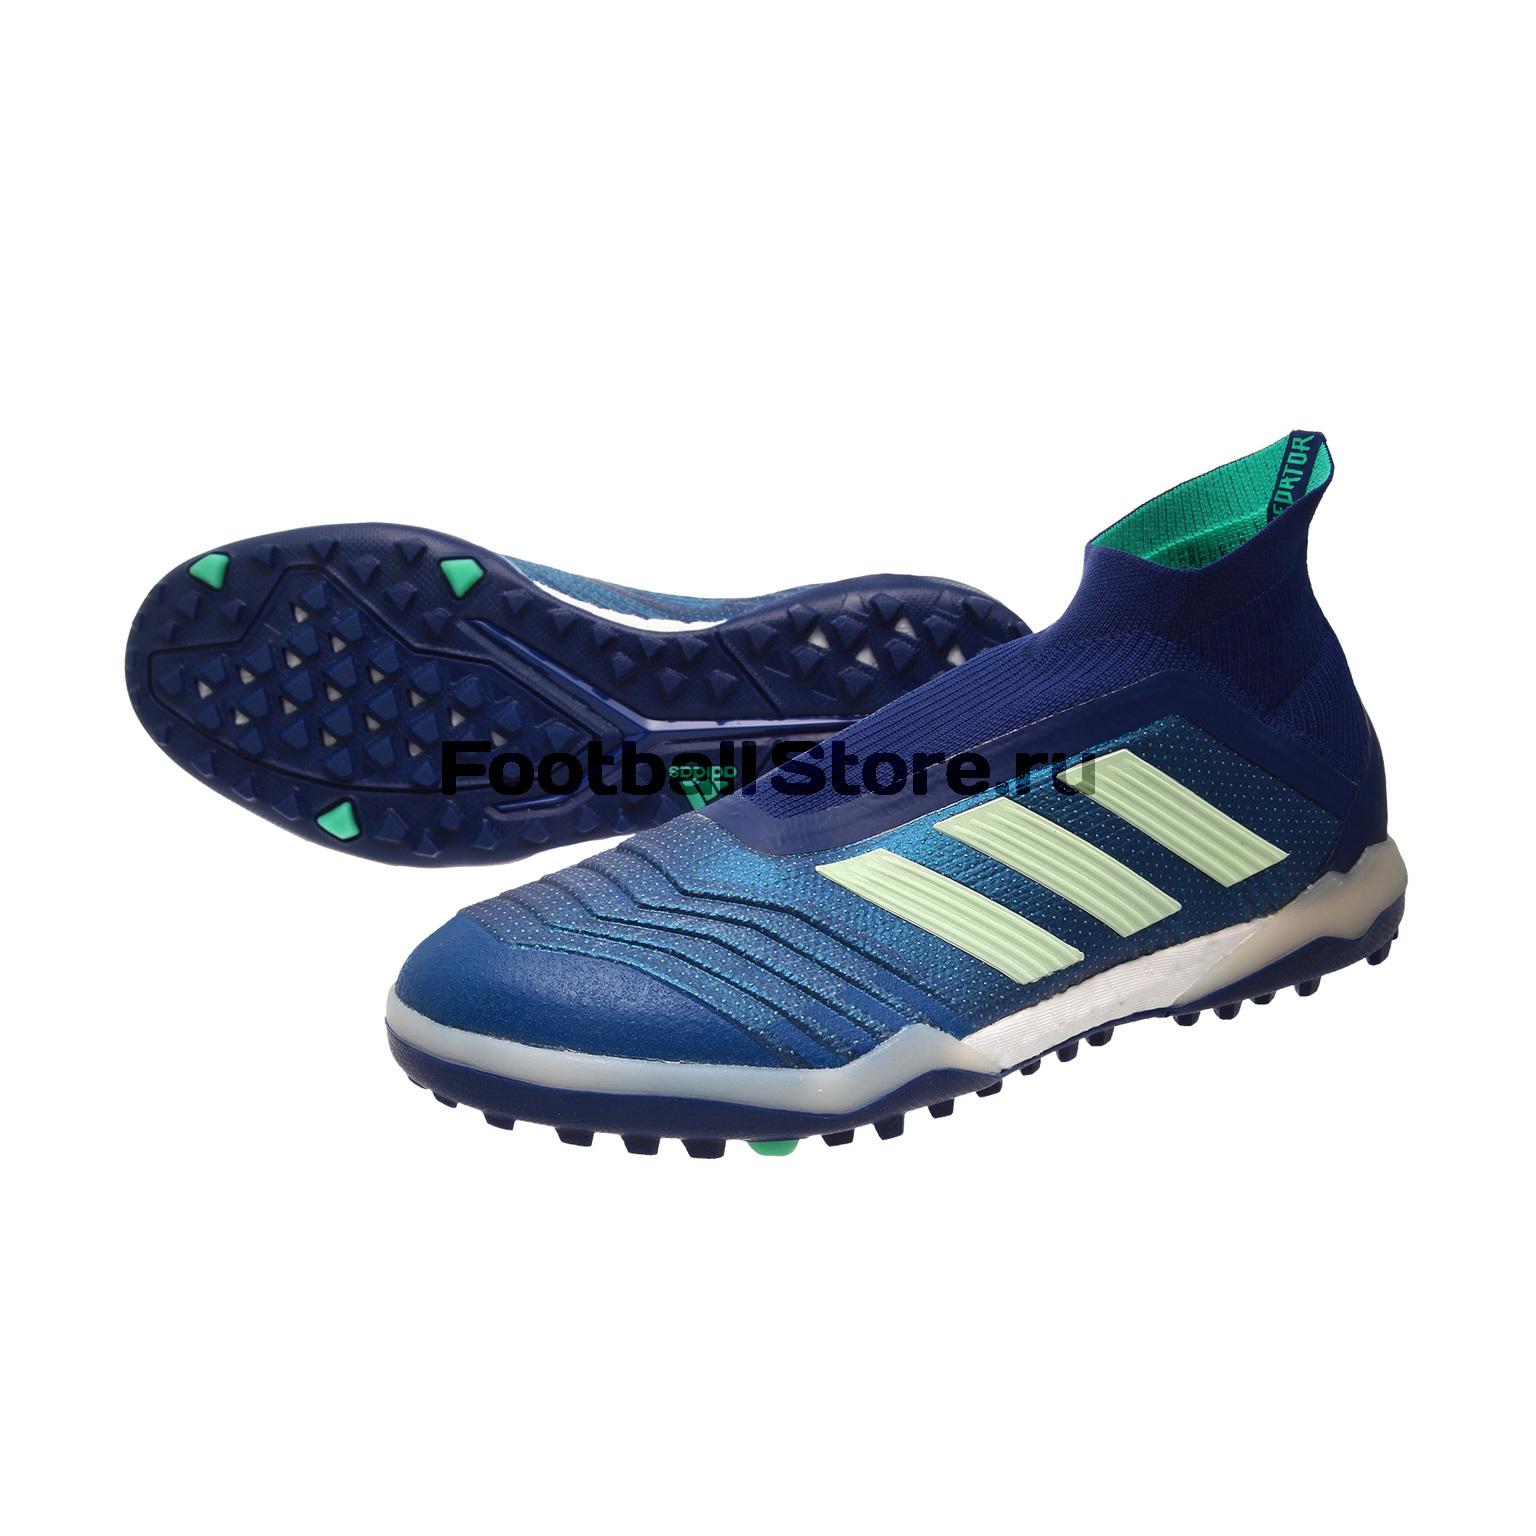 Шиповки Adidas Predator Tango 18+ TF CM7675 adidas predator junior gk glove